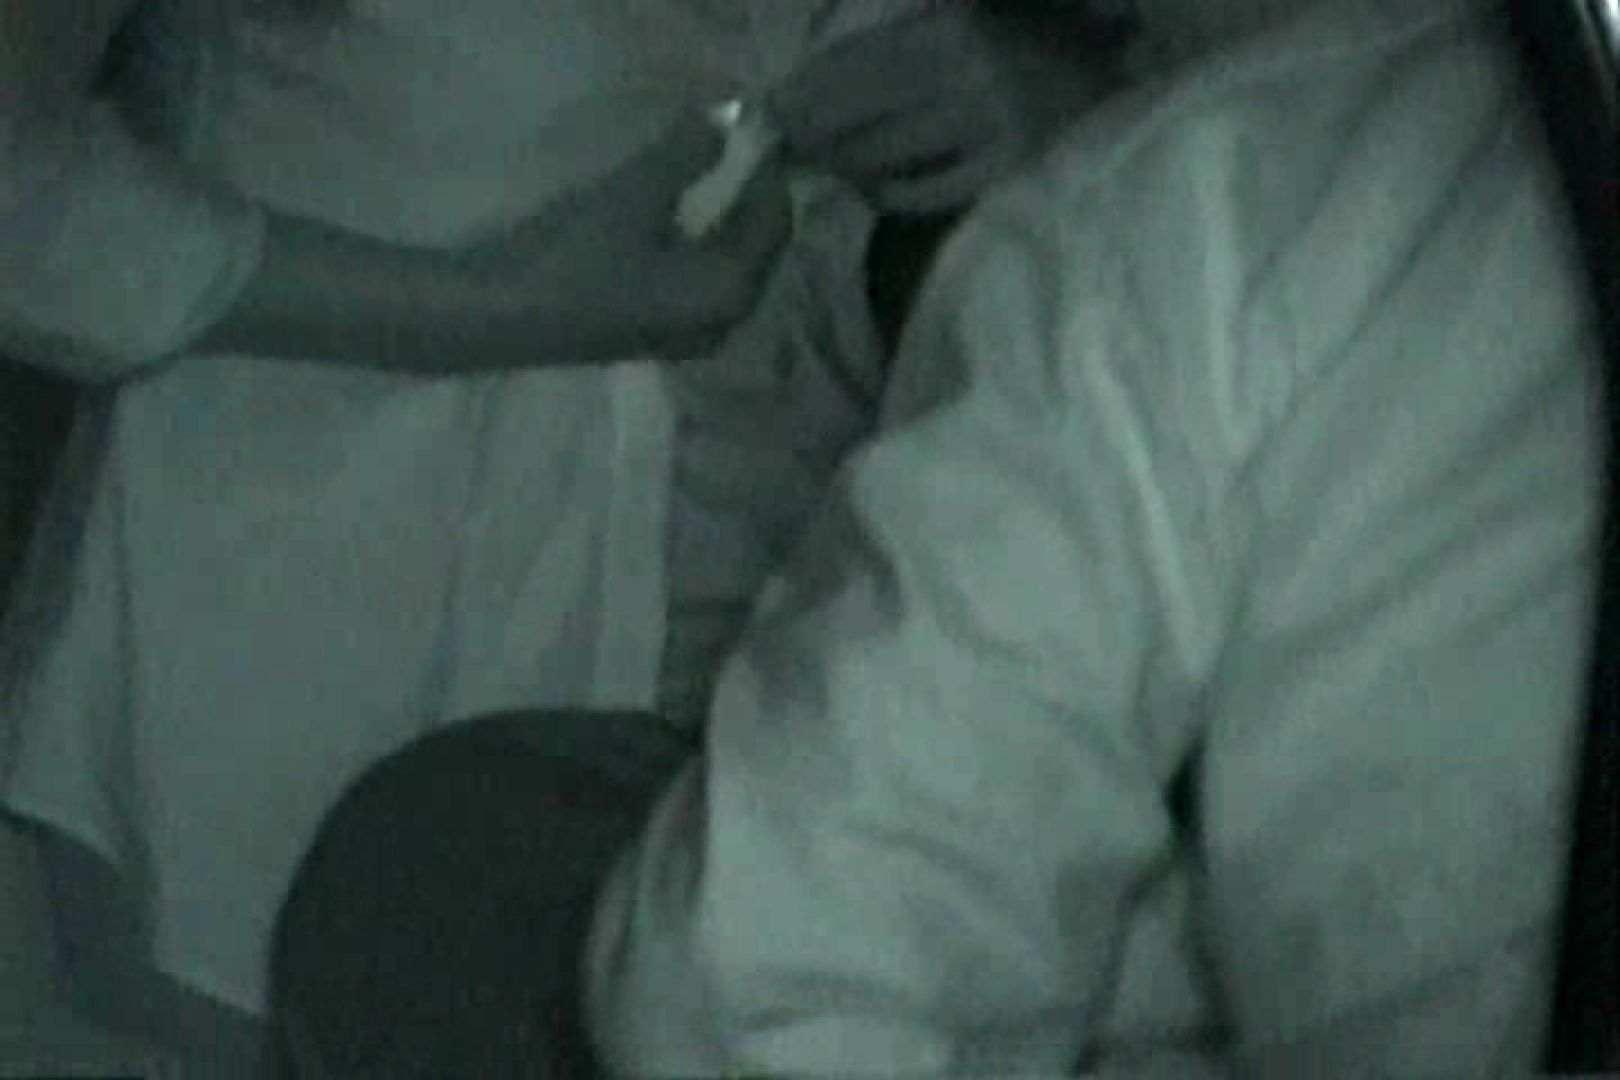 充血監督の深夜の運動会Vol.125 接写 オメコ無修正動画無料 63画像 13